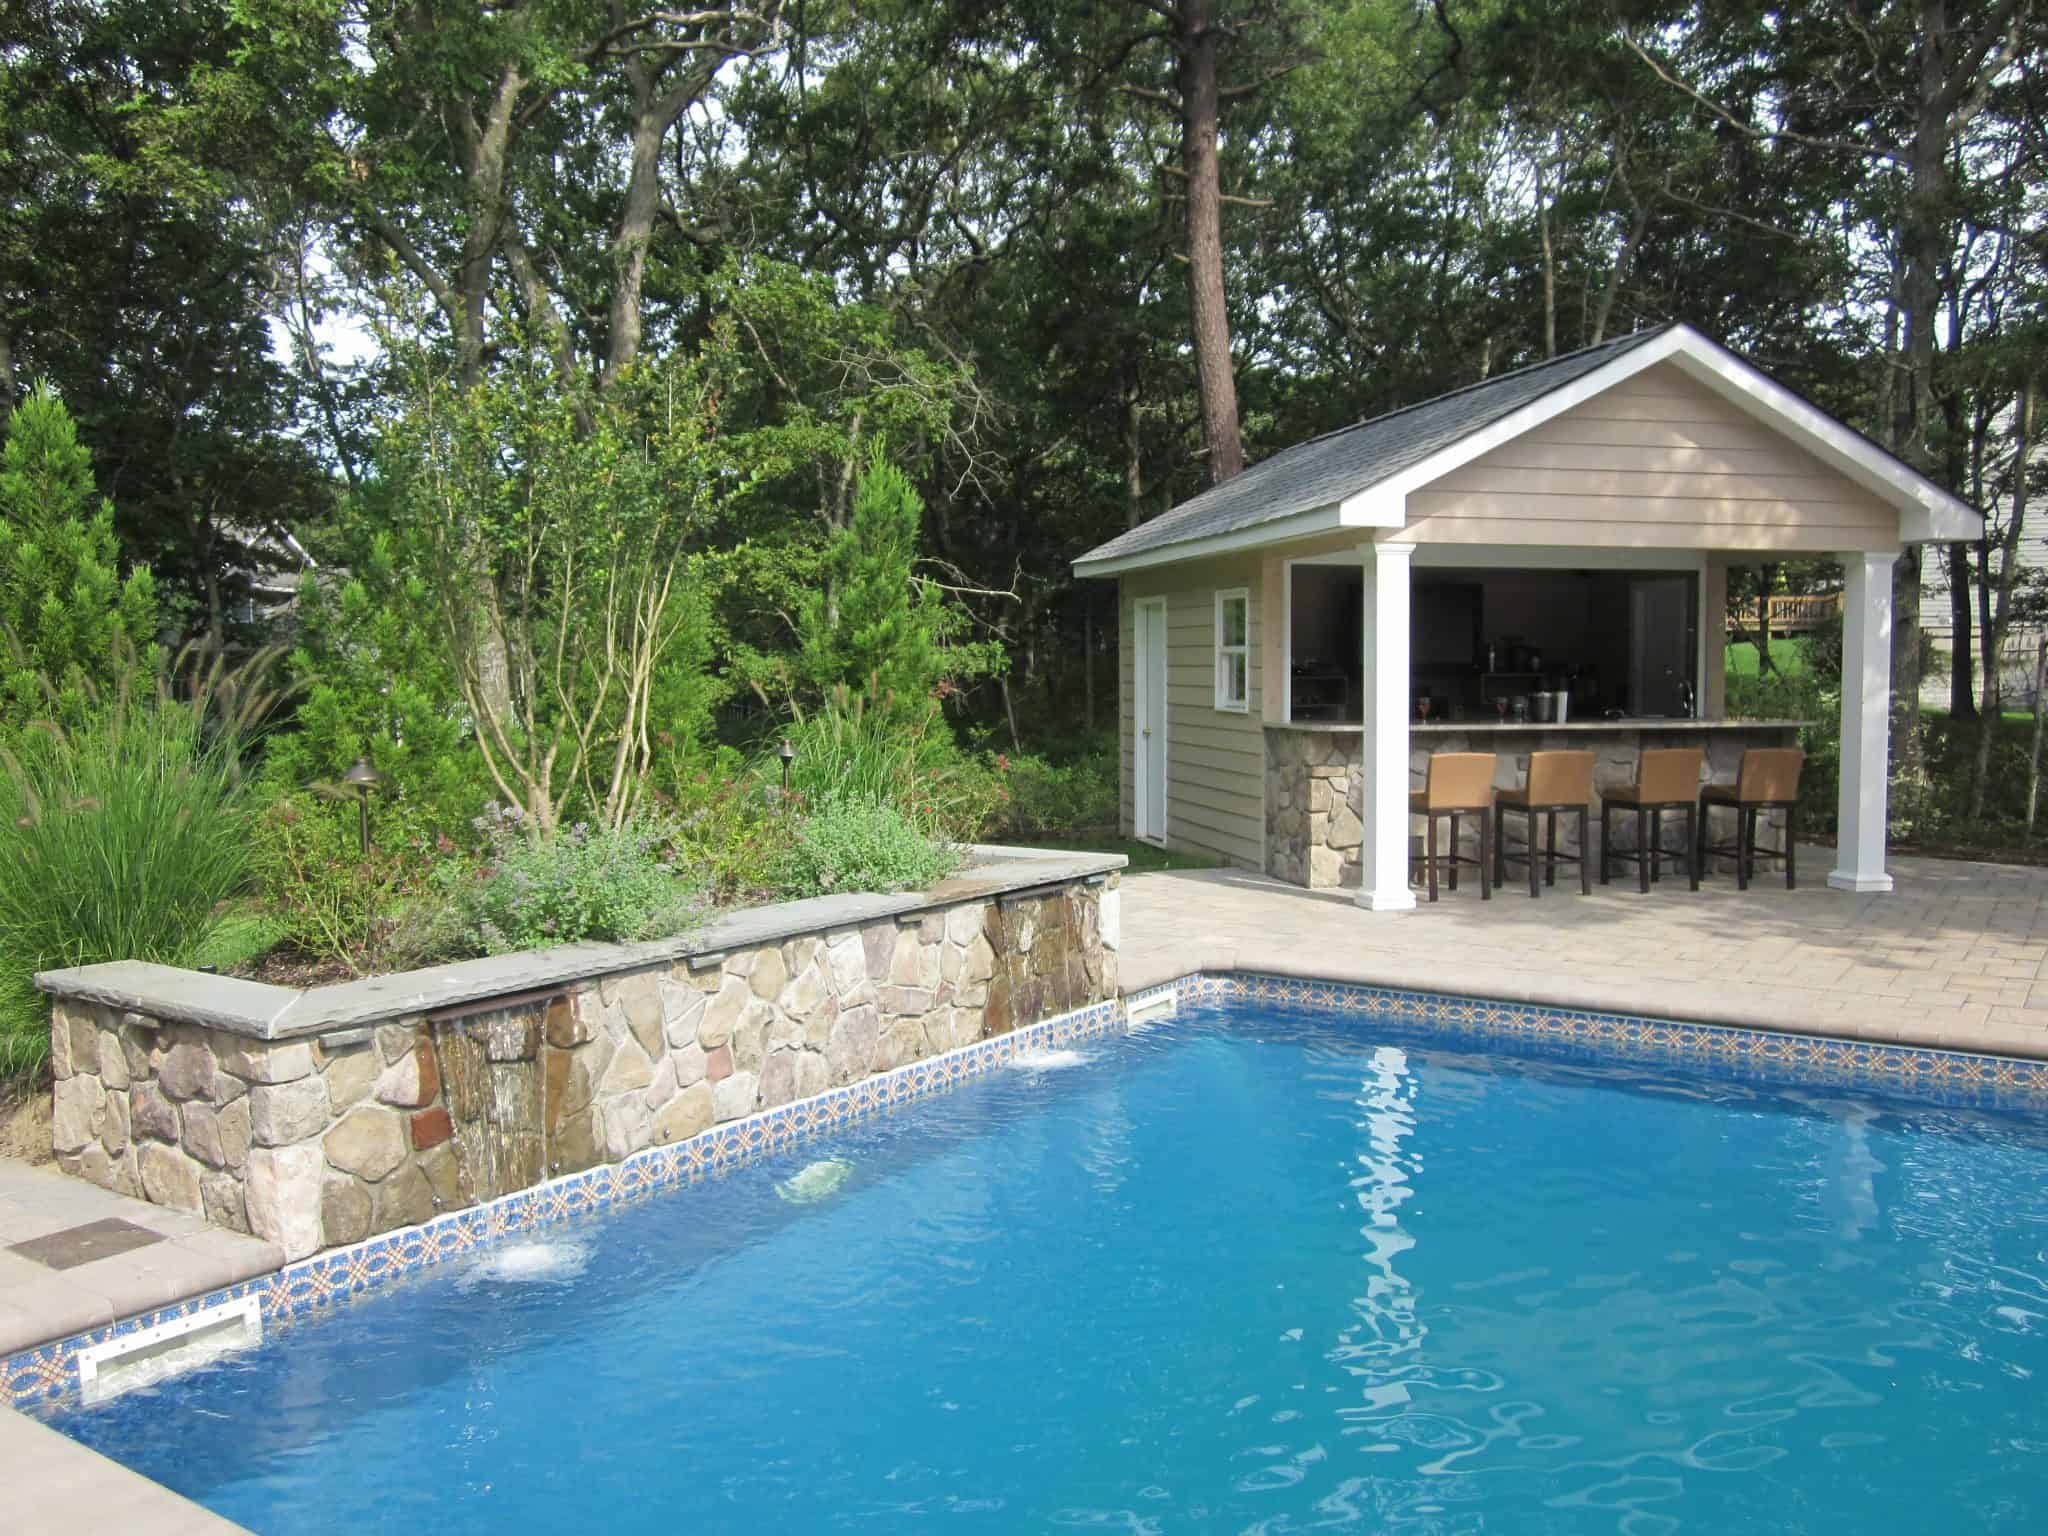 Custom carpentry cabanas pool houses long island for Pool house designs